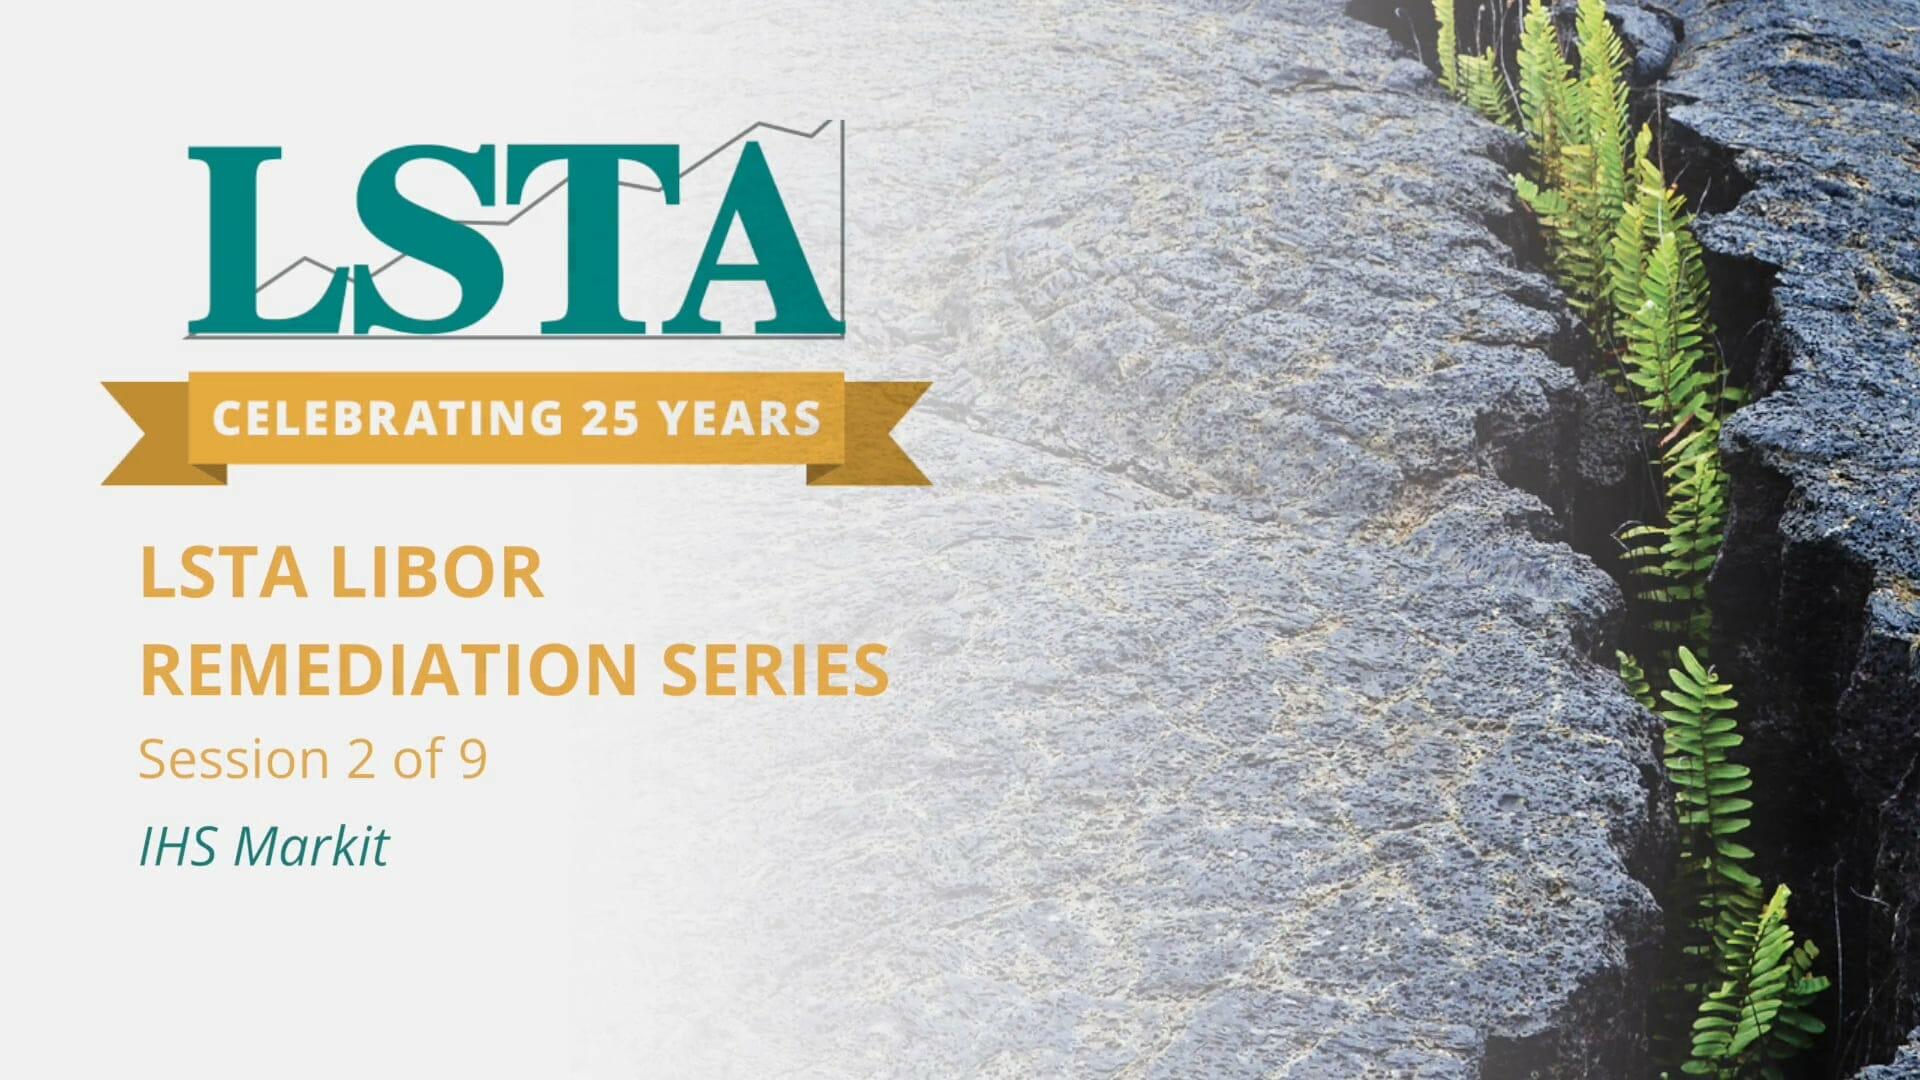 LSTA LIBOR Remediation Series Video – IHS Markit